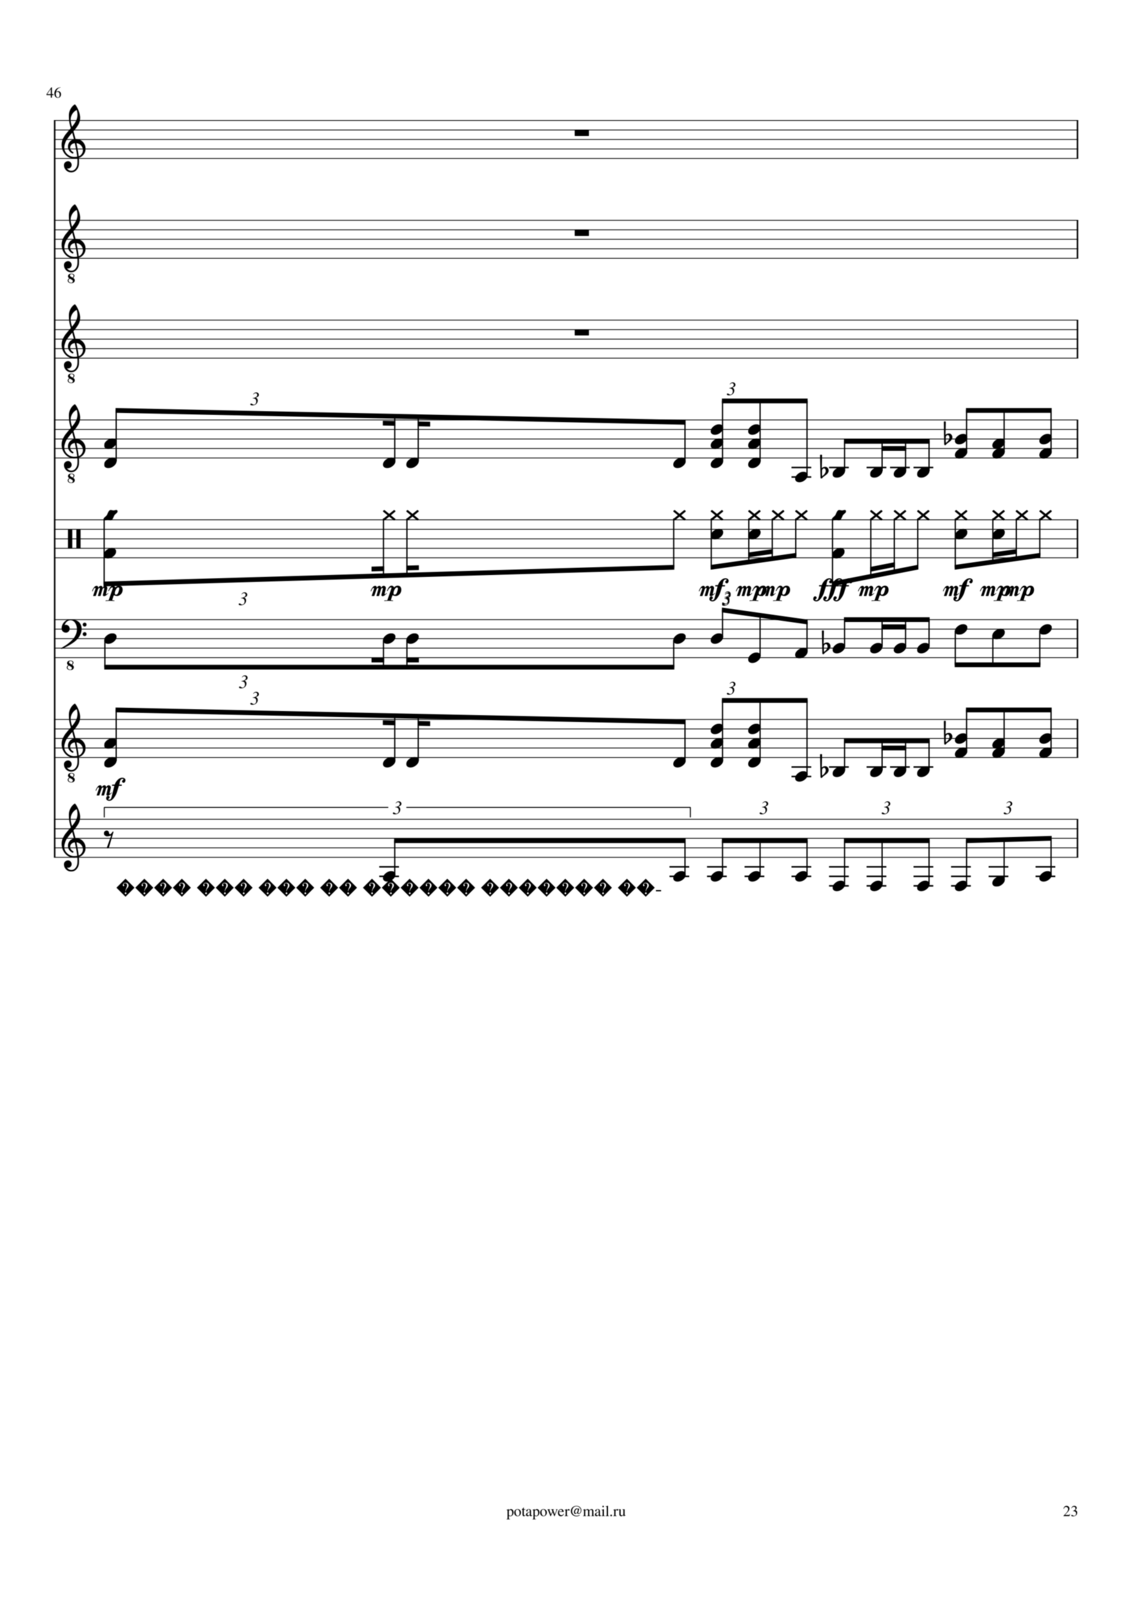 Korolevstvo slez slide, Image 23